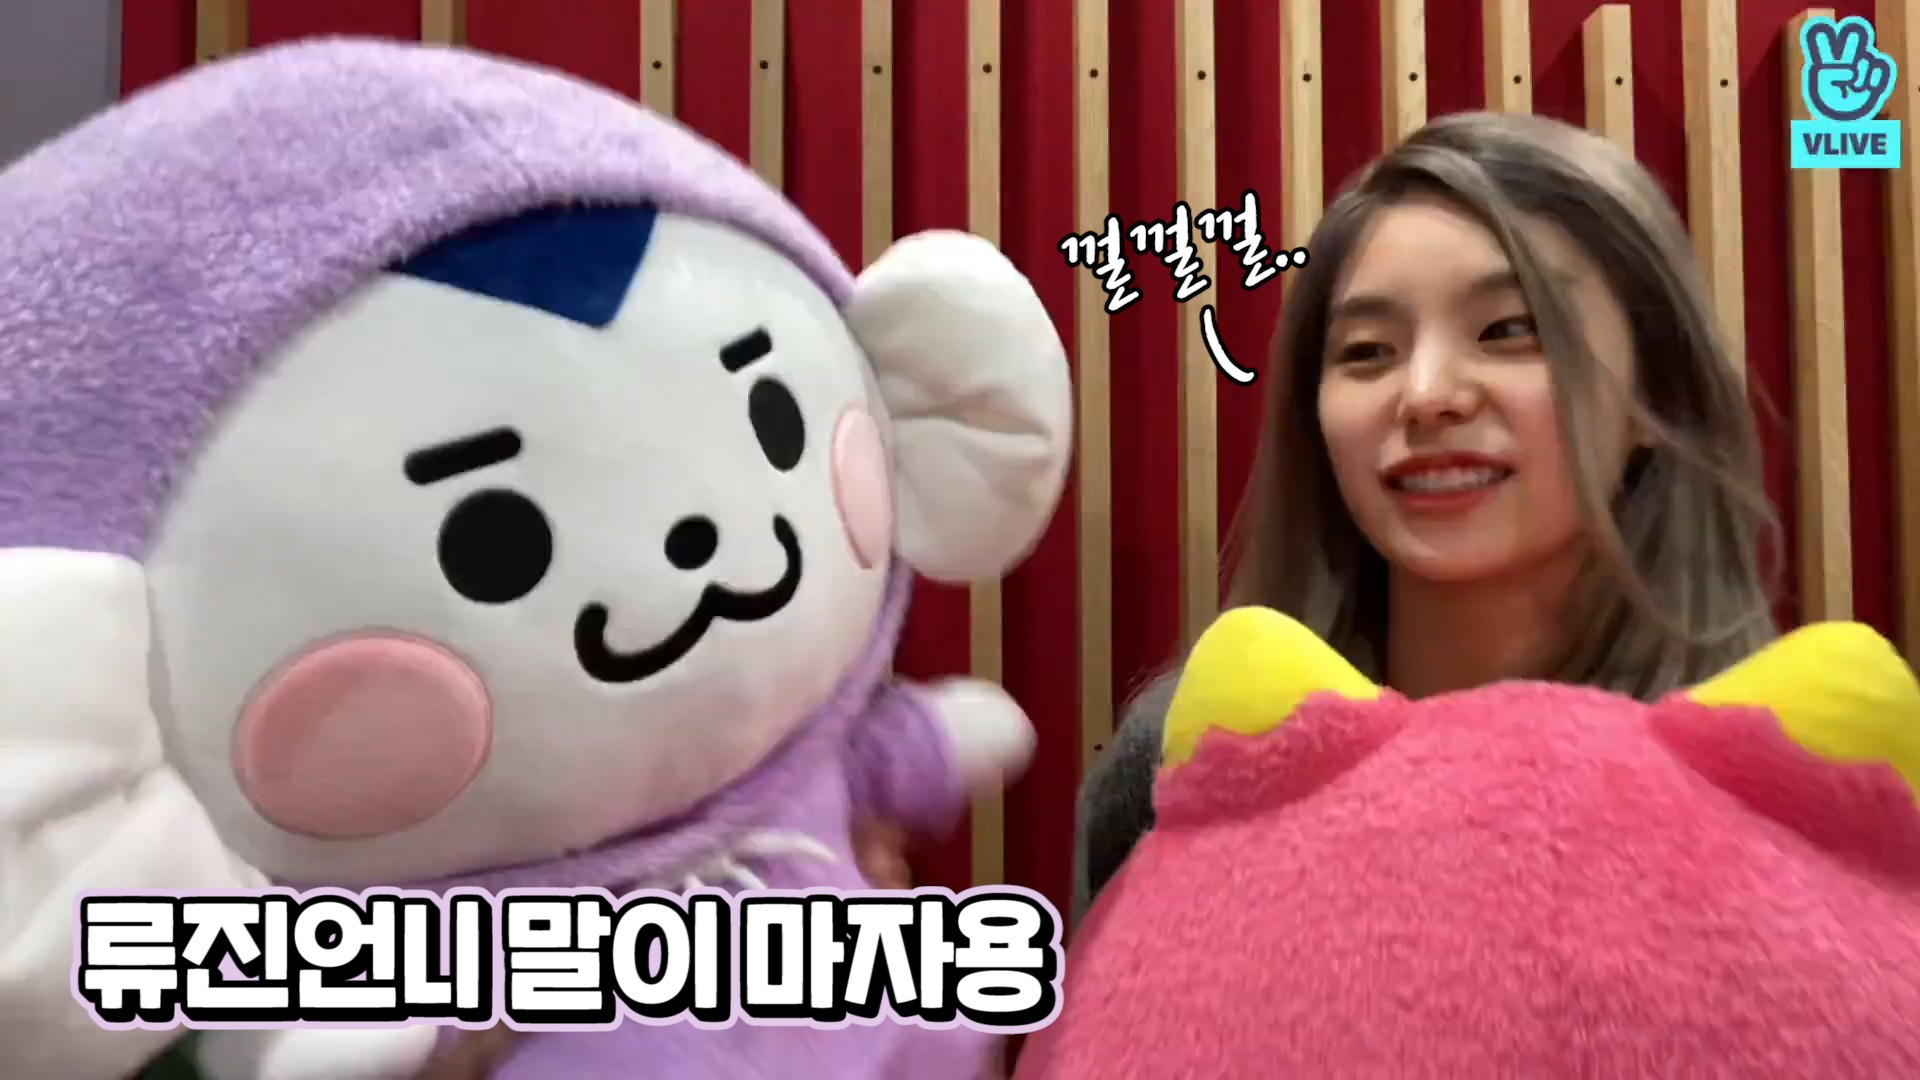 [ITZY] 툭햇과 함께하는 우당탕탕 땡덩이네🔔 (Ryujin&Yeji's V with WDZY dolls)